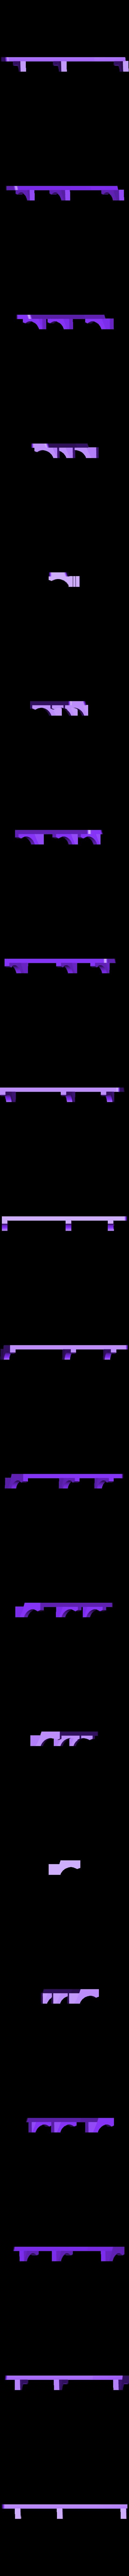 MirrorRun_Board_Front-C.STL Download free STL file 4-8-8-4 Big Boy Locomotive • 3D printer object, RaymondDeLuca